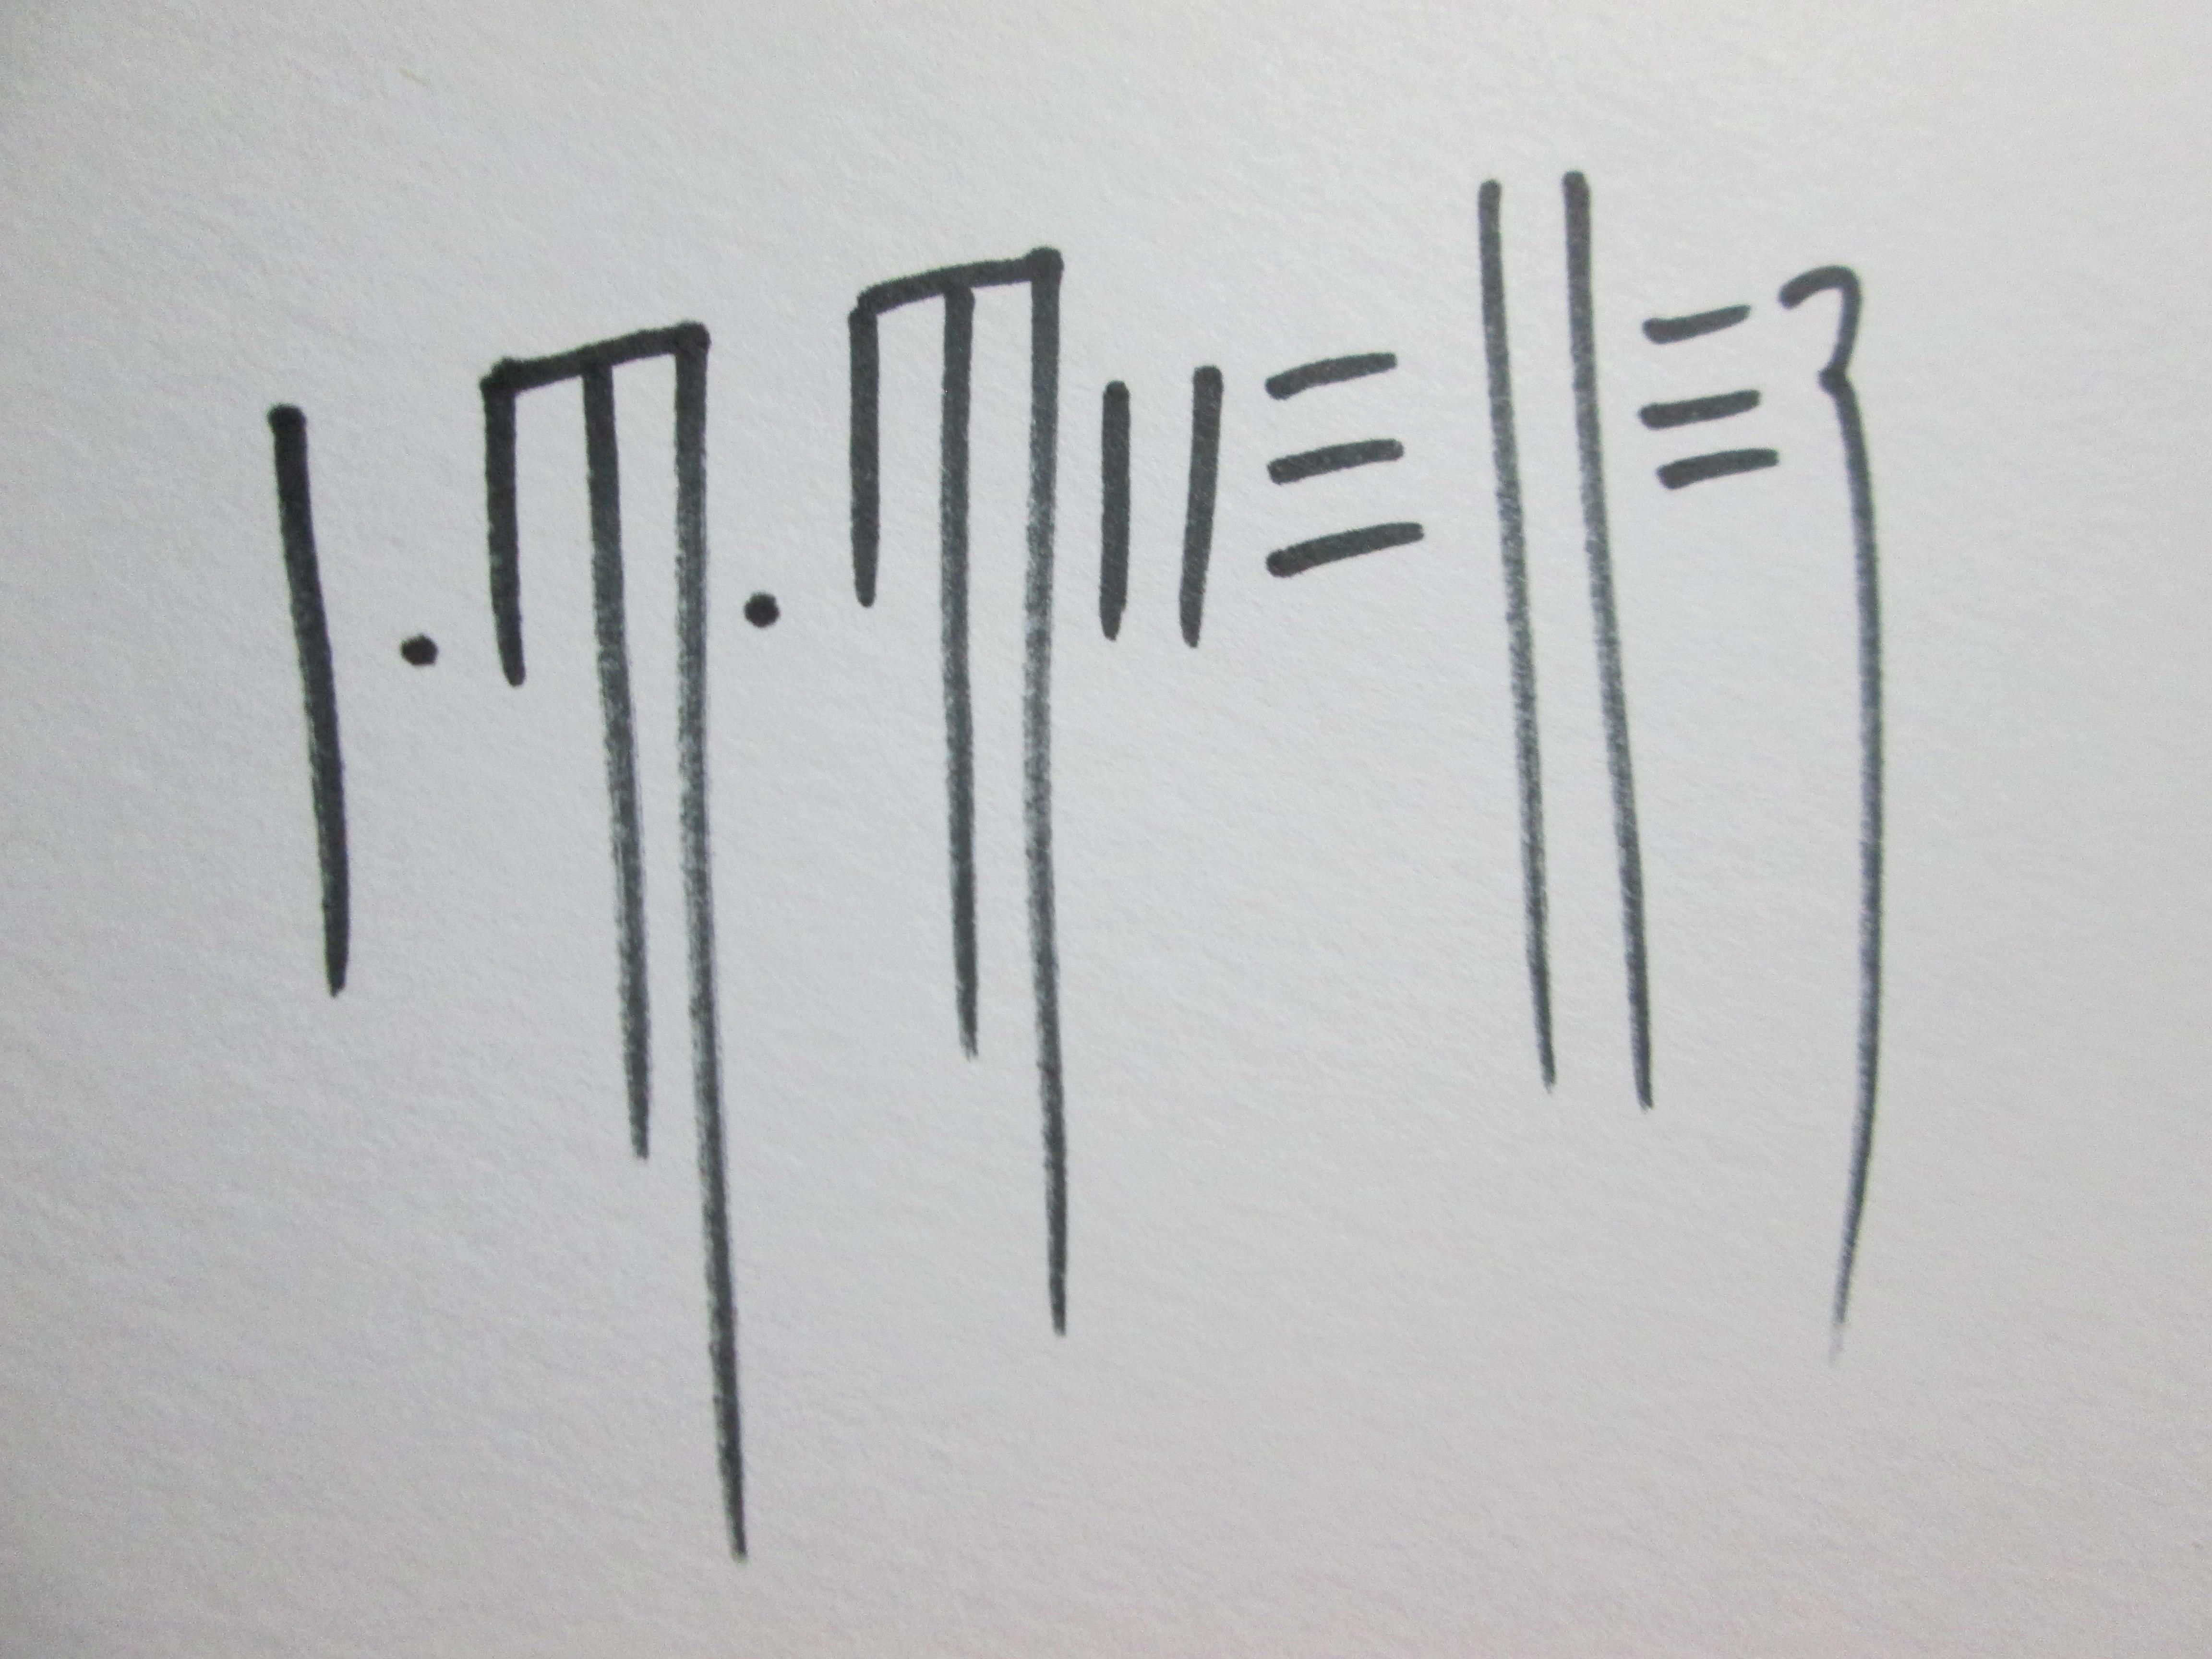 Iracema Marianne Mueller's Signature